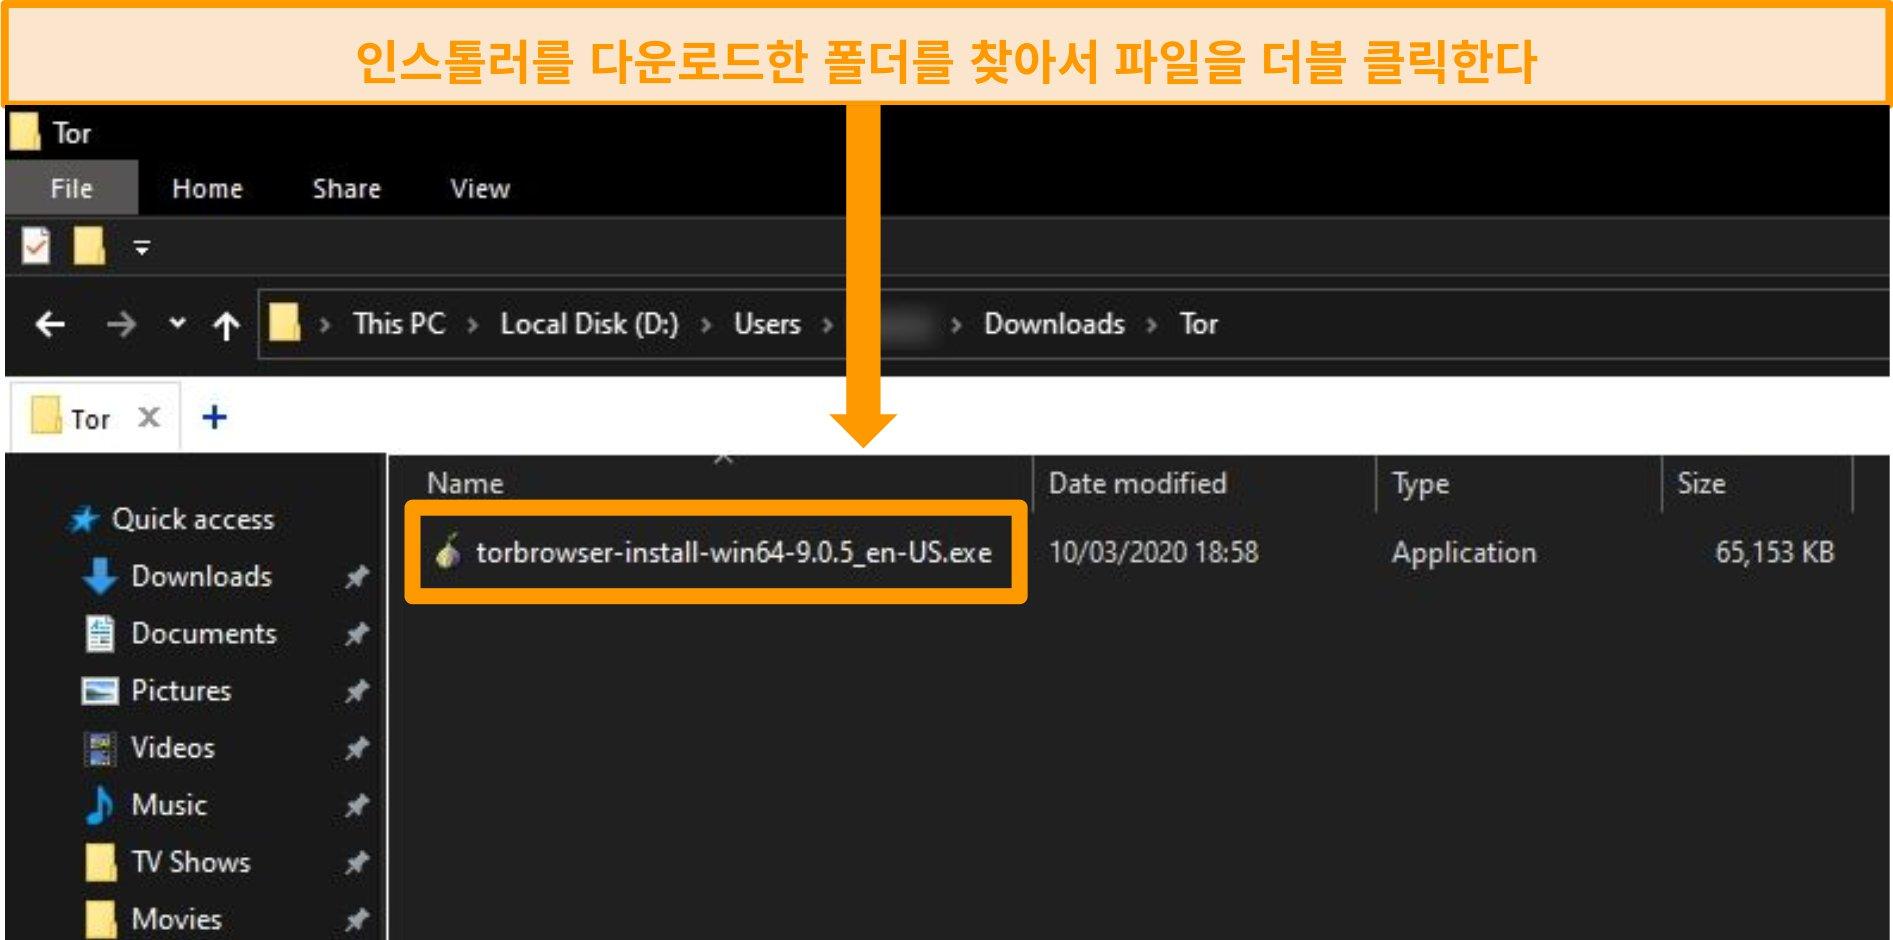 Windows 10의 다운로드 폴더에있는 Tor 설치 프로그램의 스크린 샷